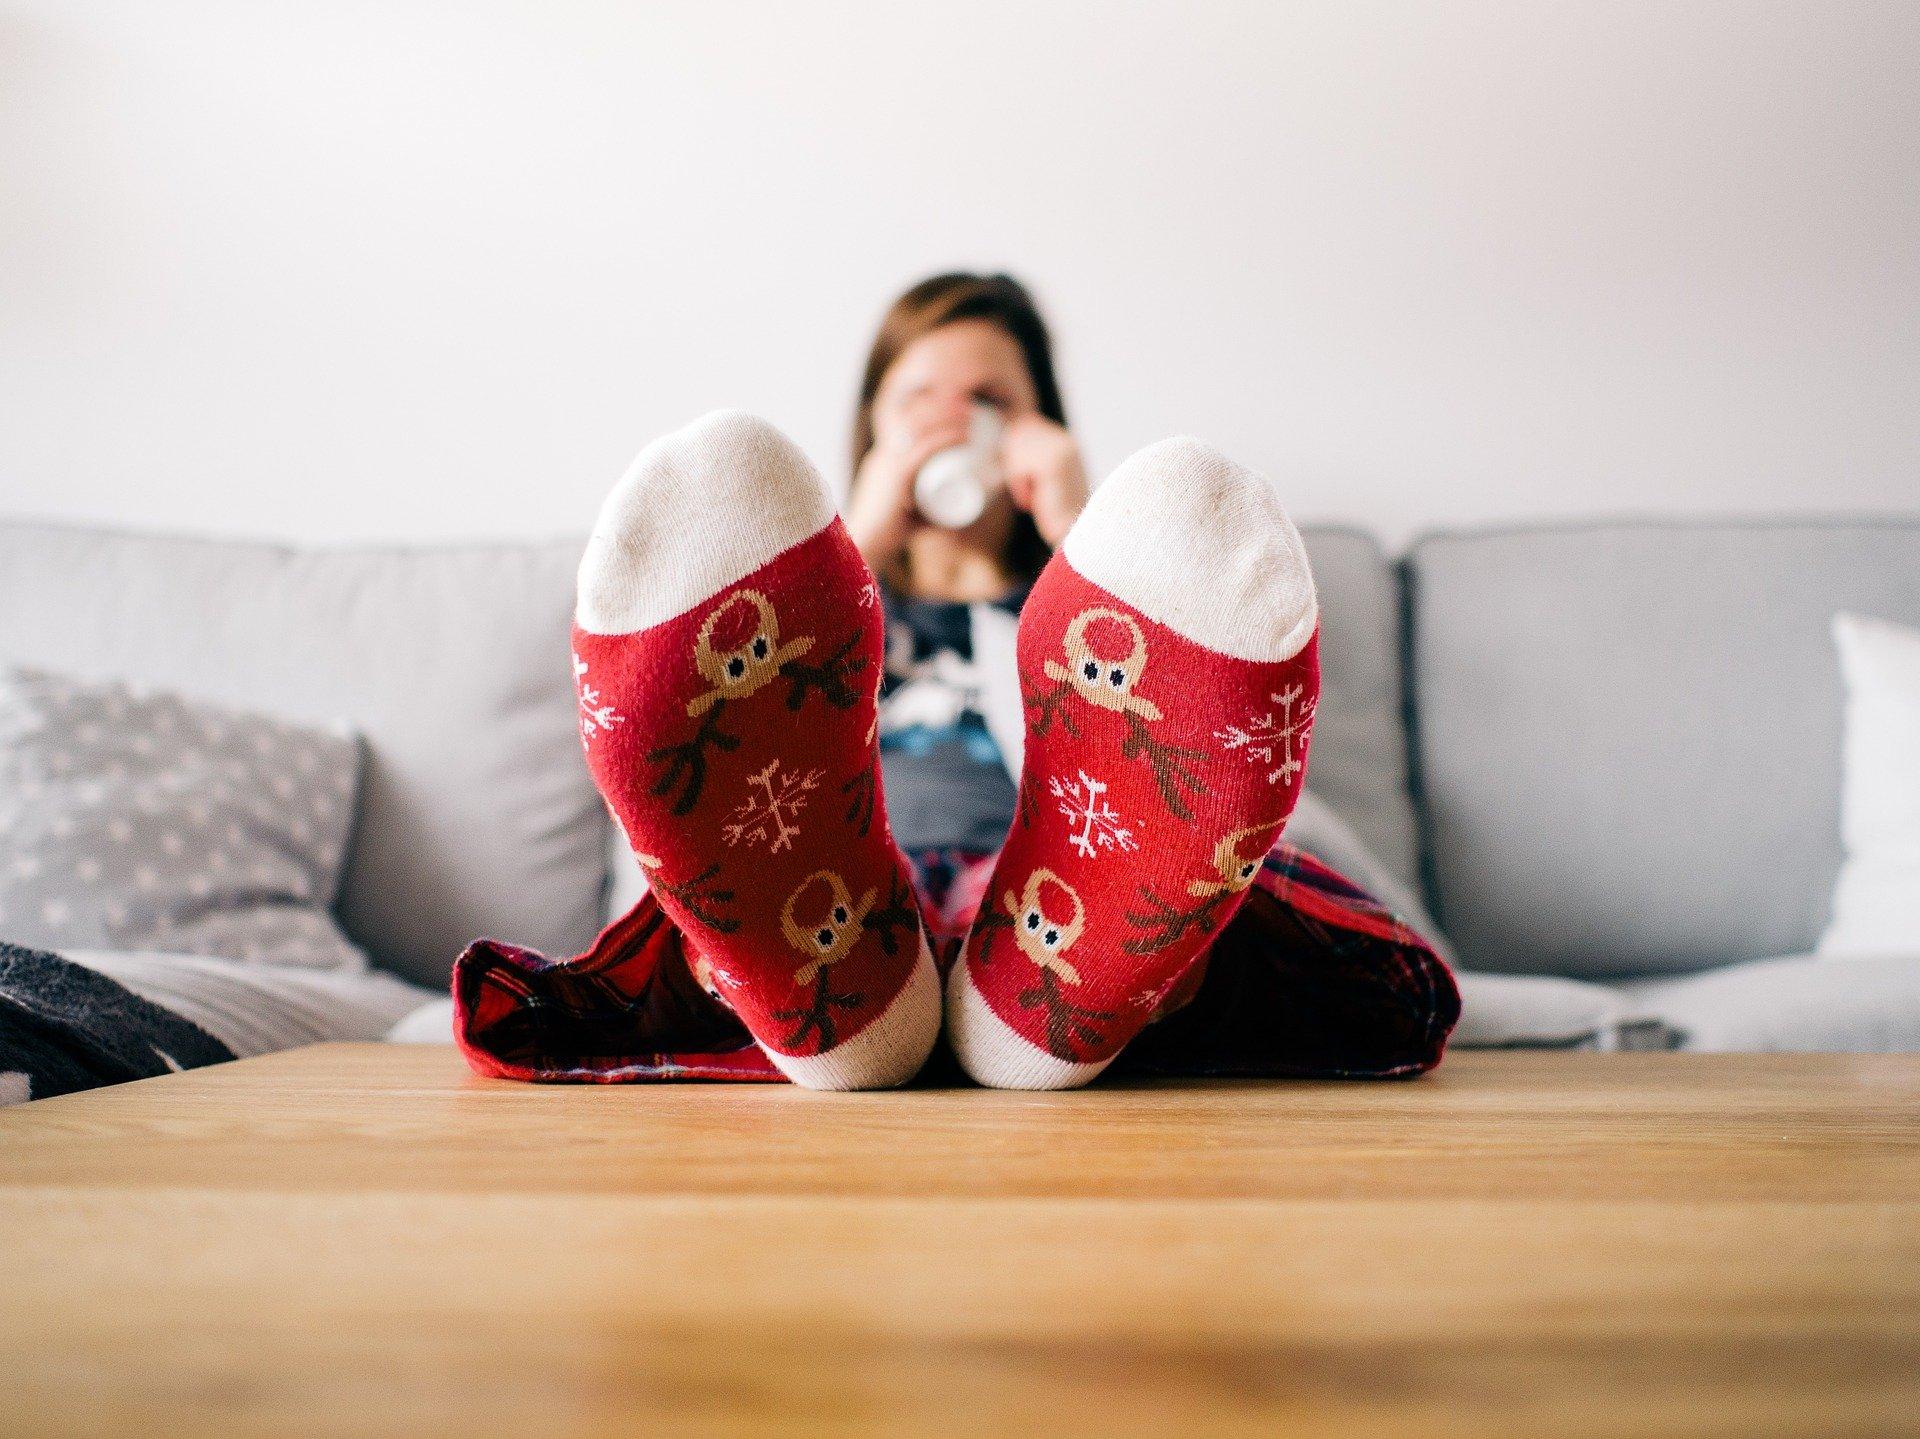 Self Care for Women This Festive Season